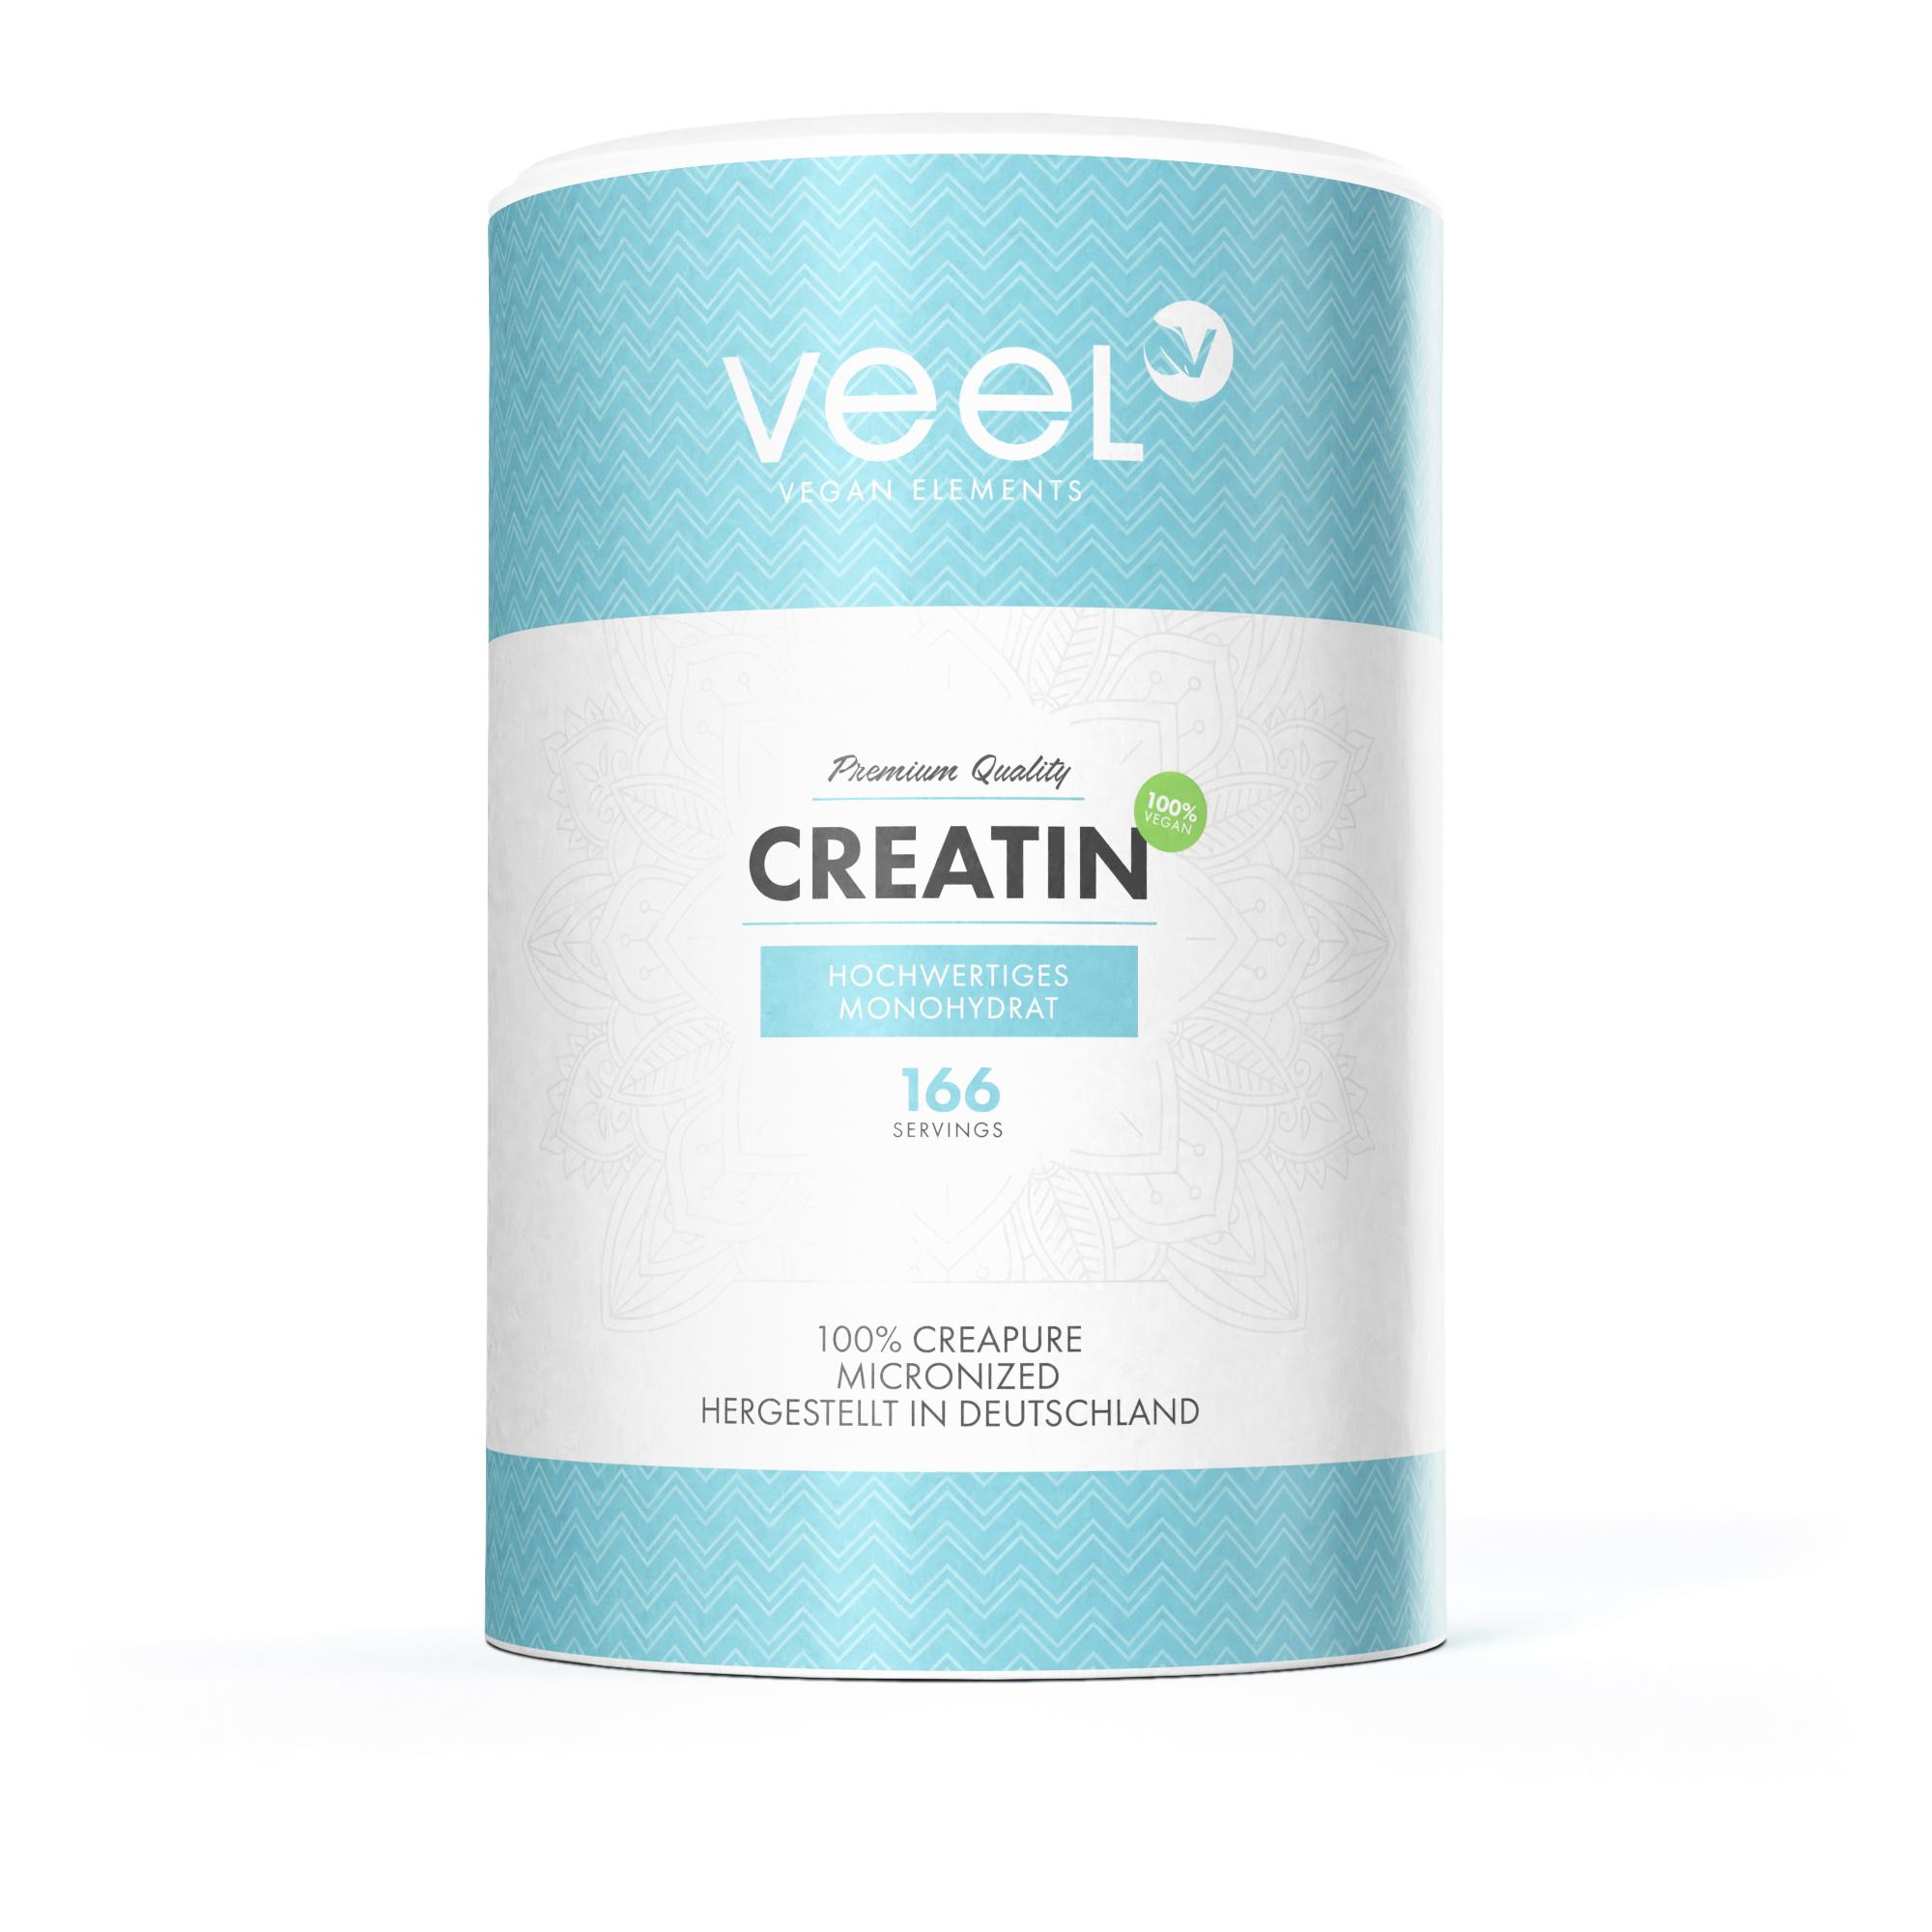 VEEL Creatin 500g